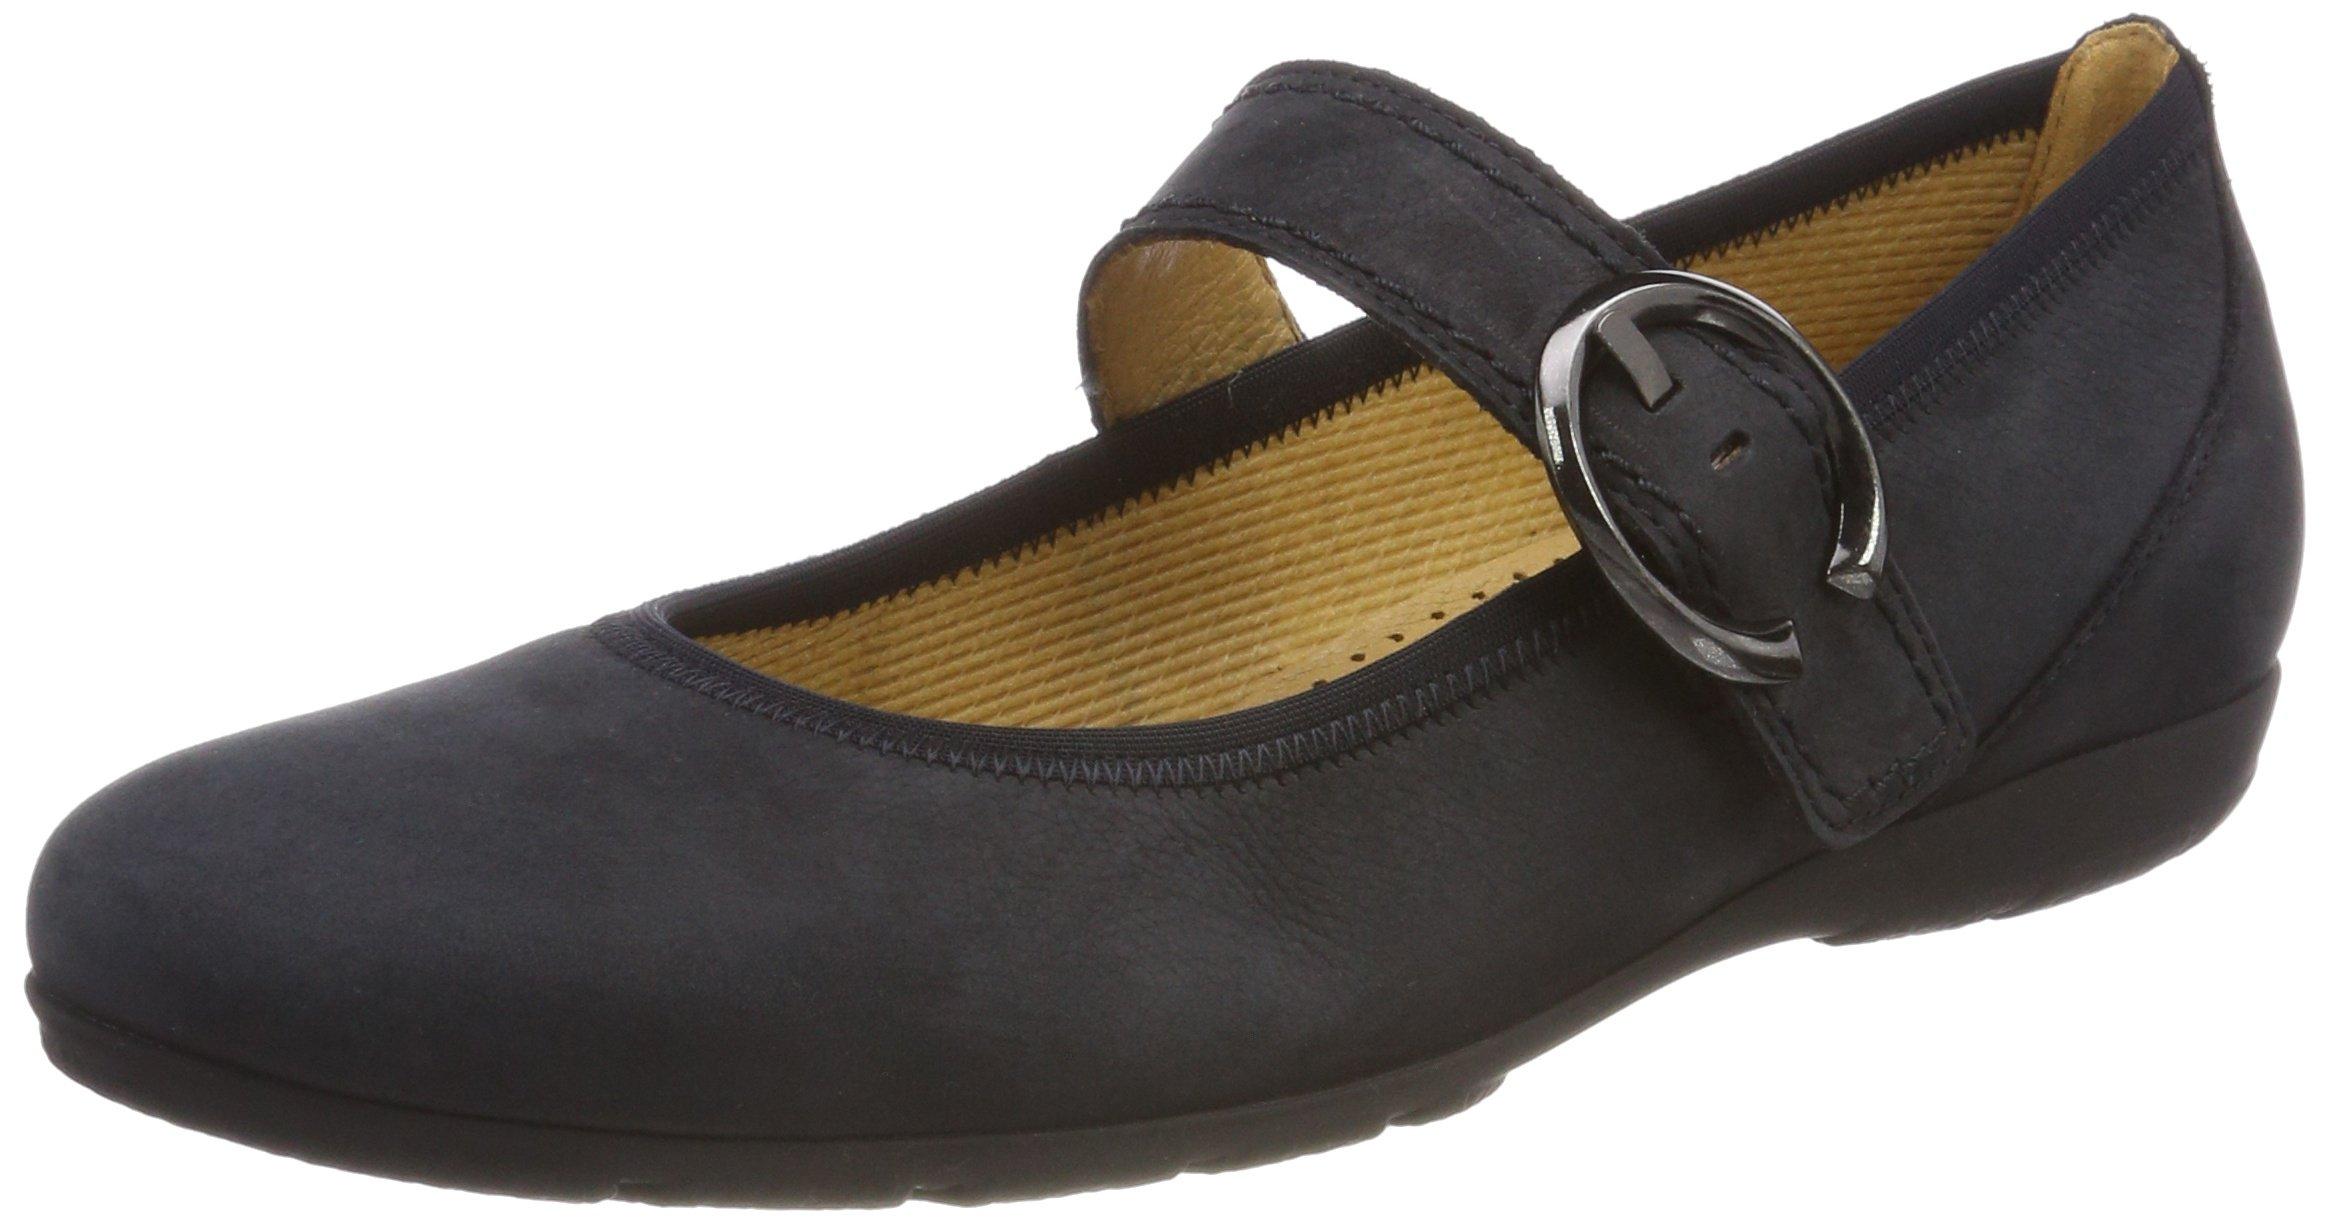 Gabor Shoes Shoes FemmeBleuocean35 FemmeBleuocean35 CasualBallerines Eu Eu Gabor CasualBallerines Gabor kXZuOPi